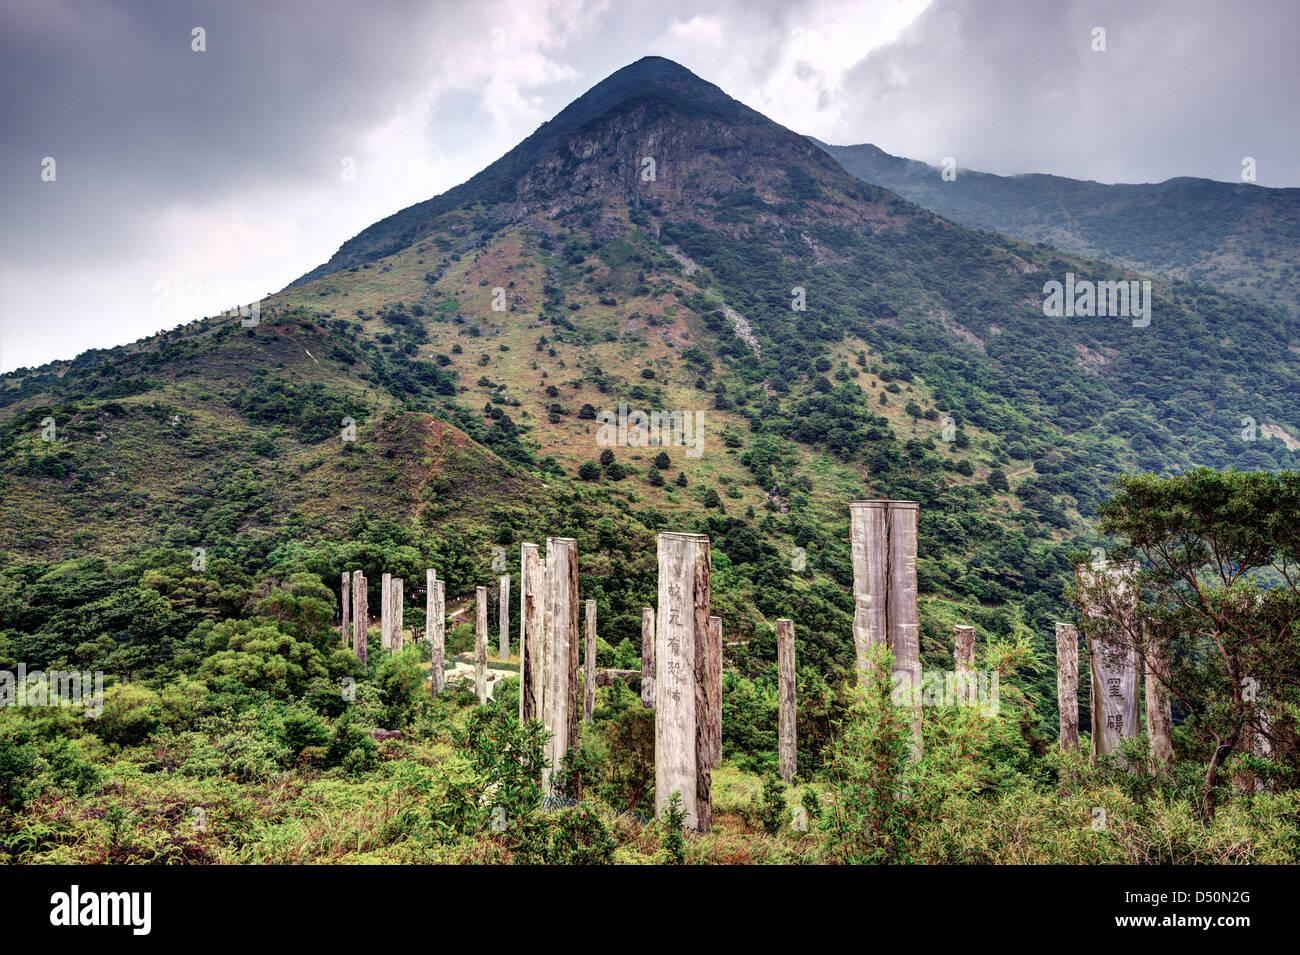 Steles containing centuries old sutra along Wisdom path at the hills of Ngong Ping on Lantau Island, Hong Kong, - Stock Image